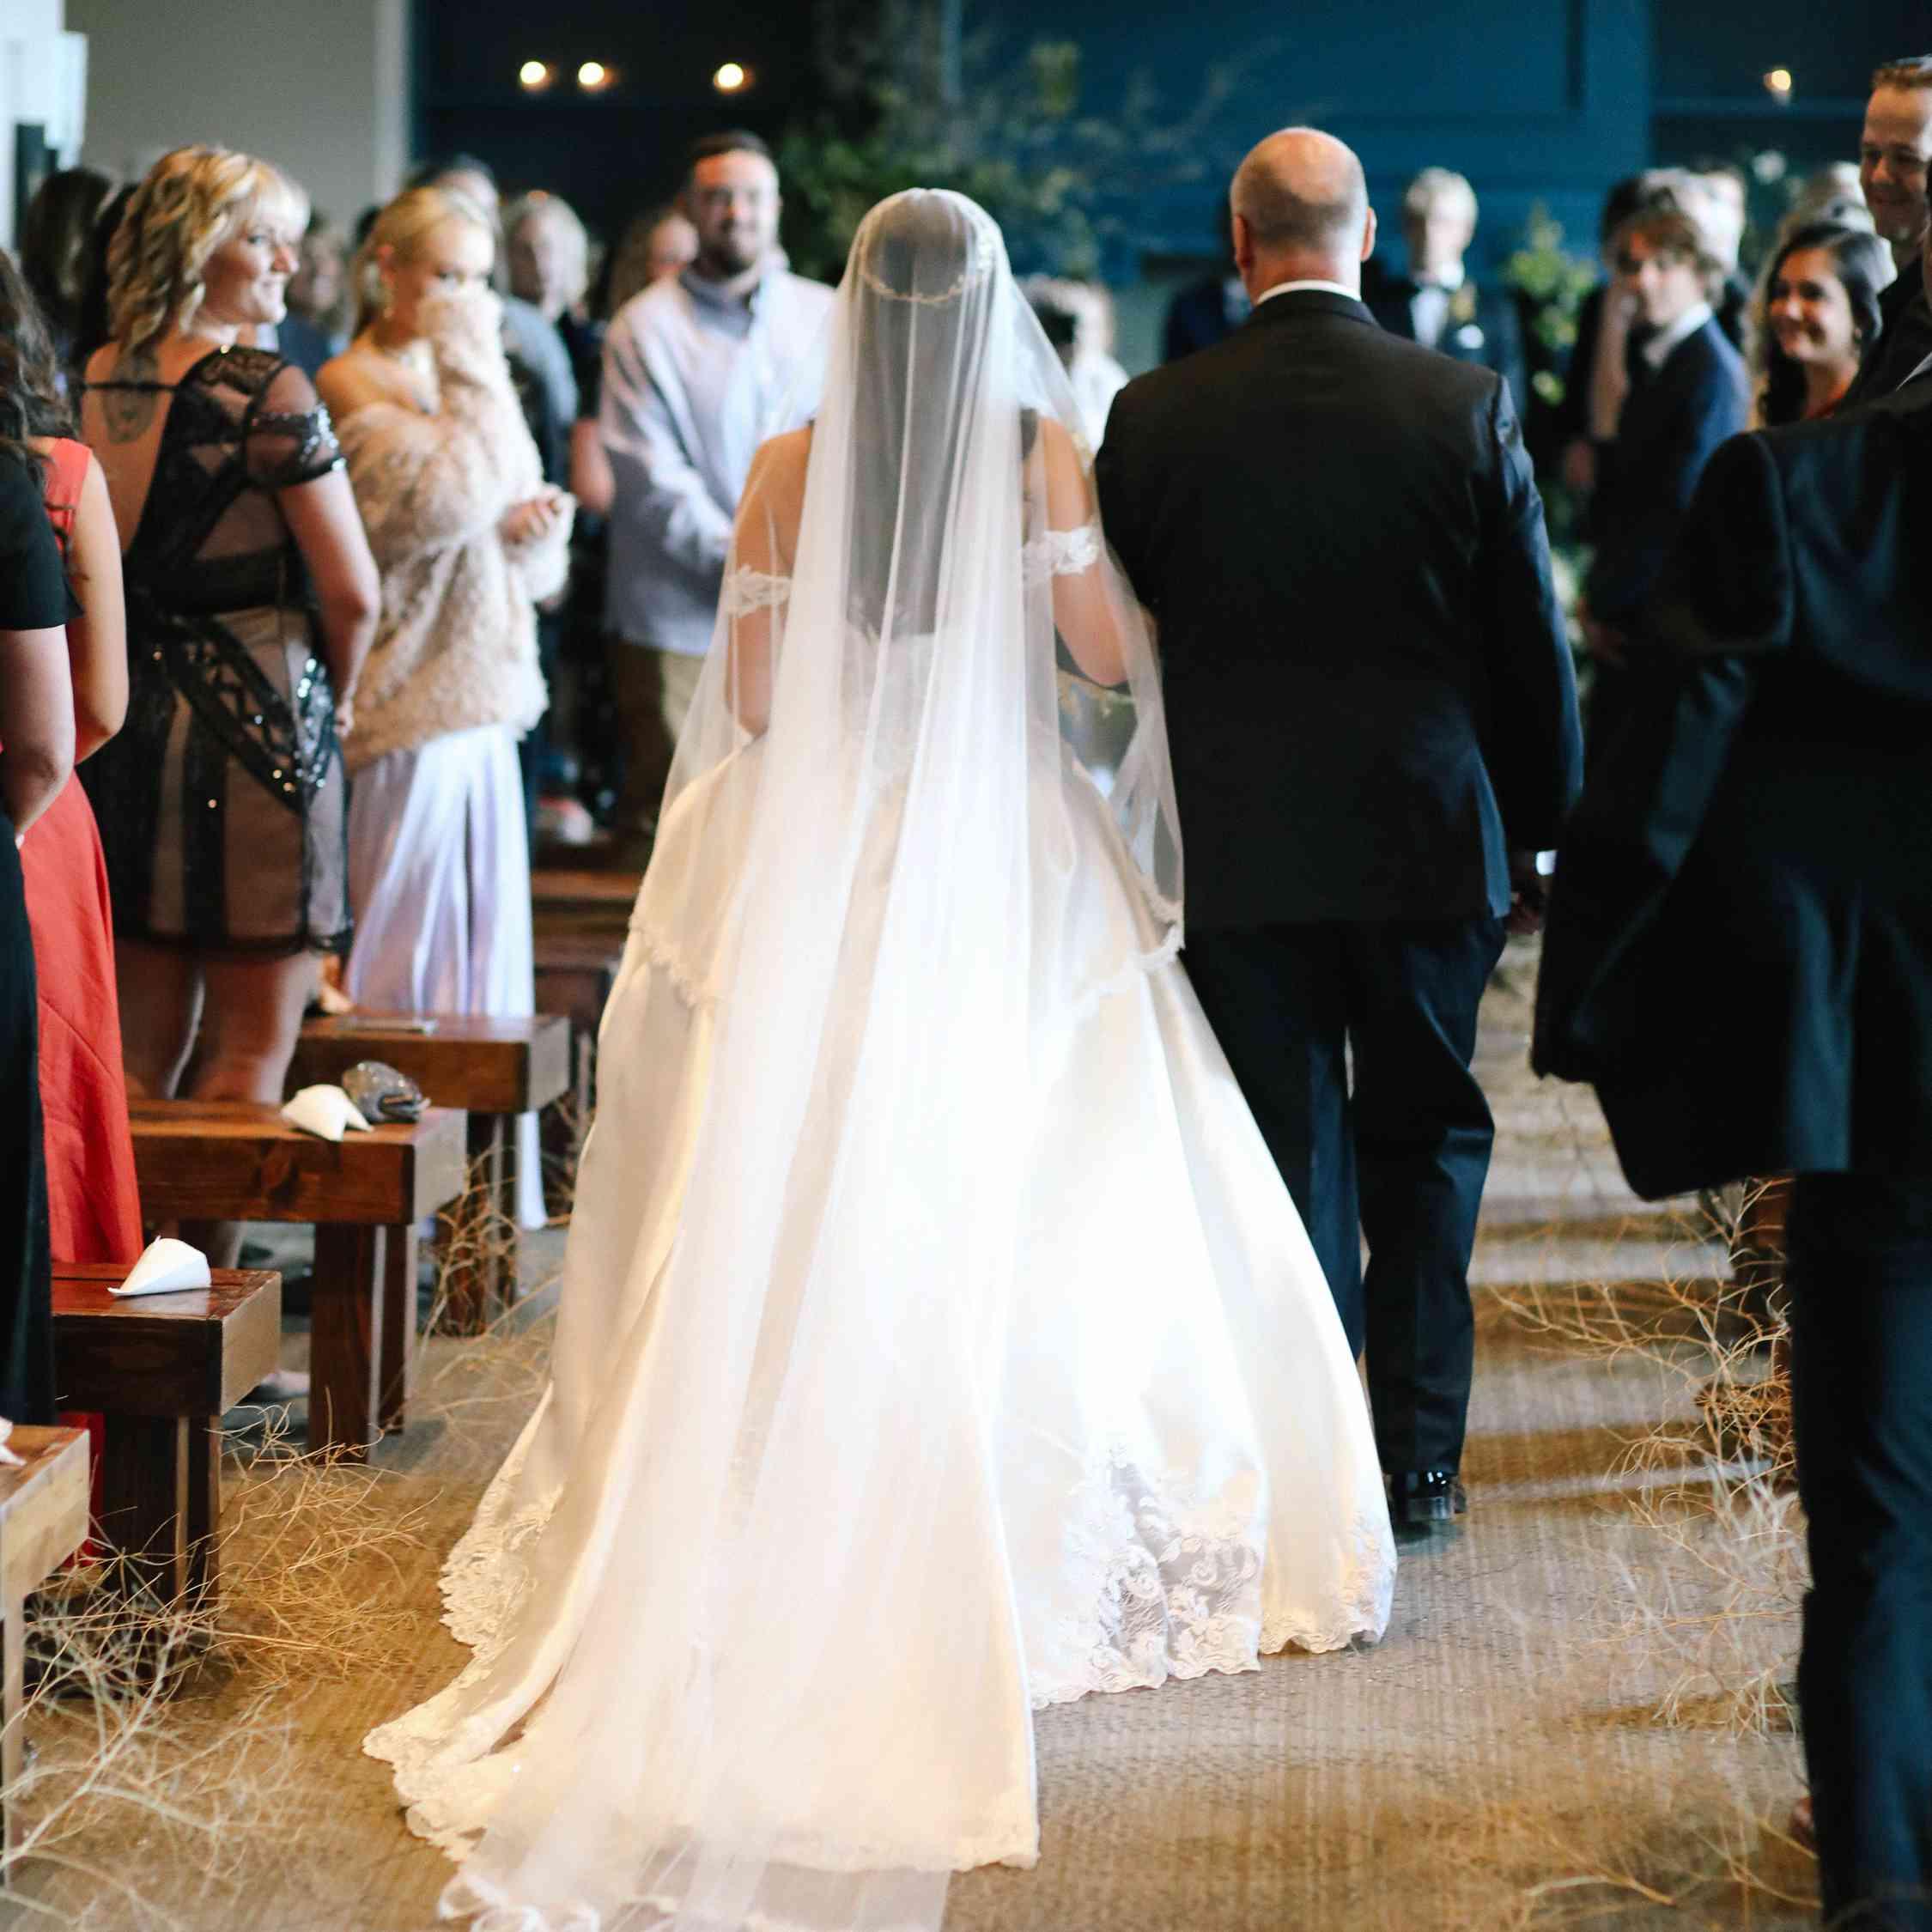 savannah and riker wedding, bride walking down aisle